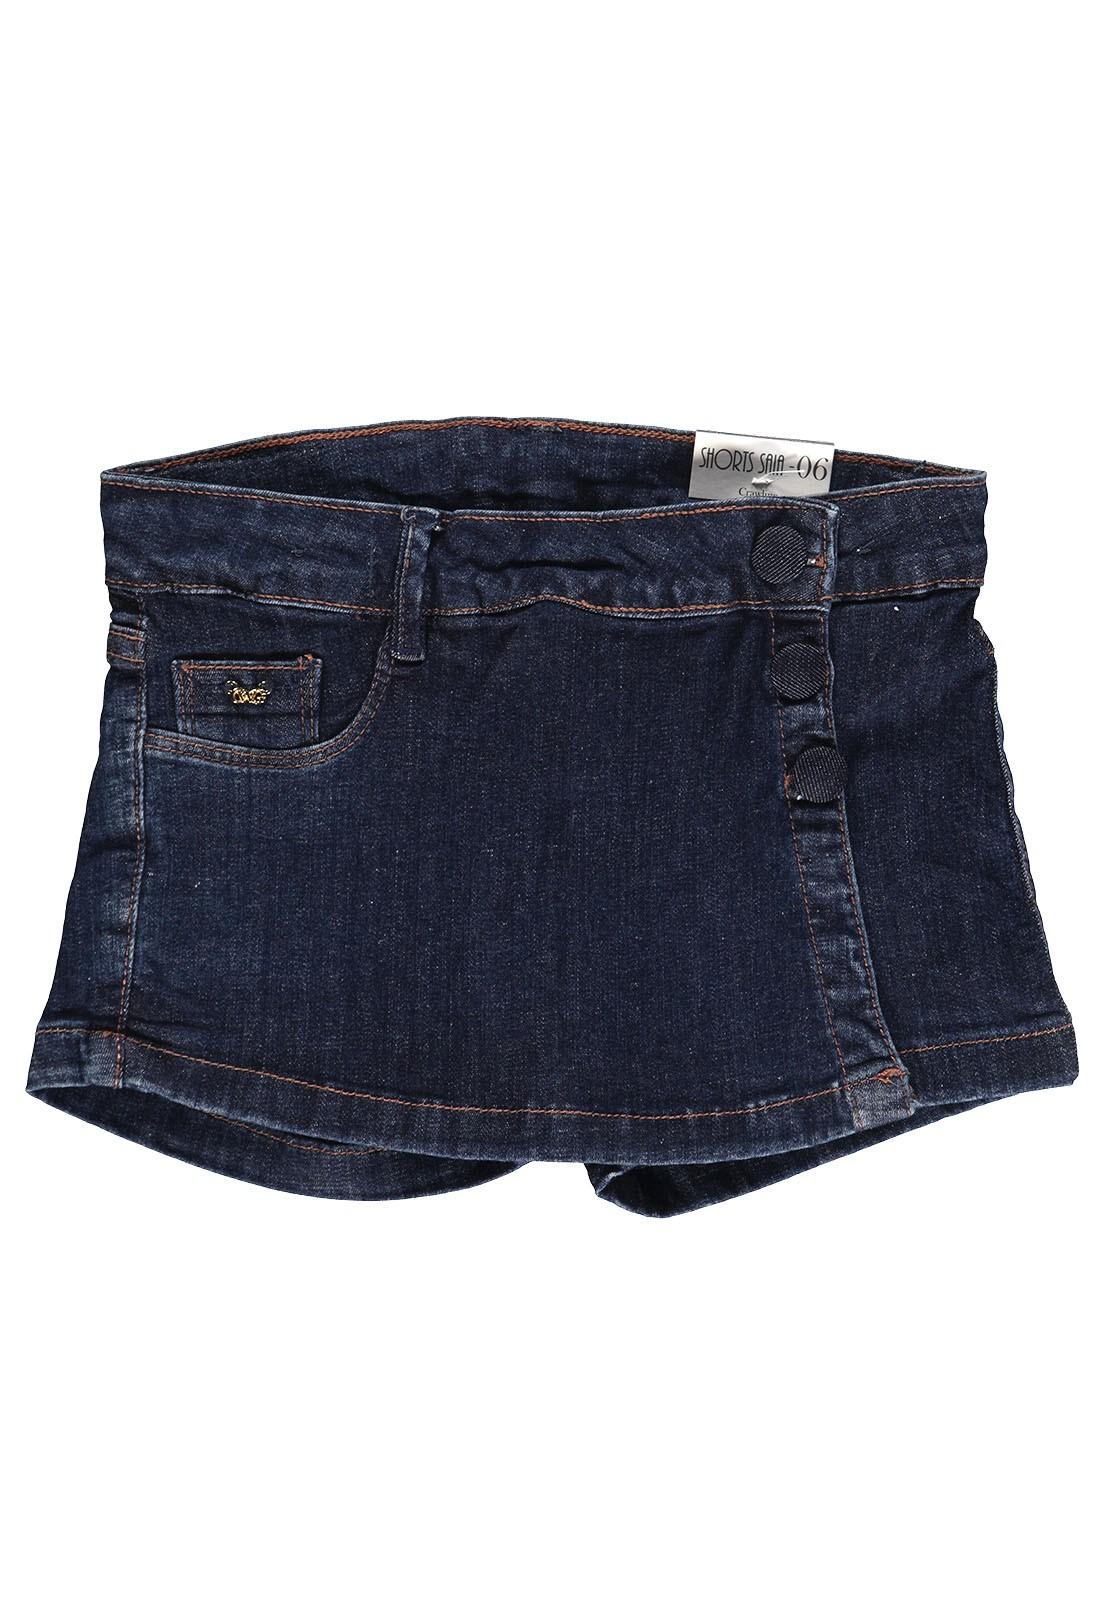 Shorts Saia Feminino Crawling Jeans